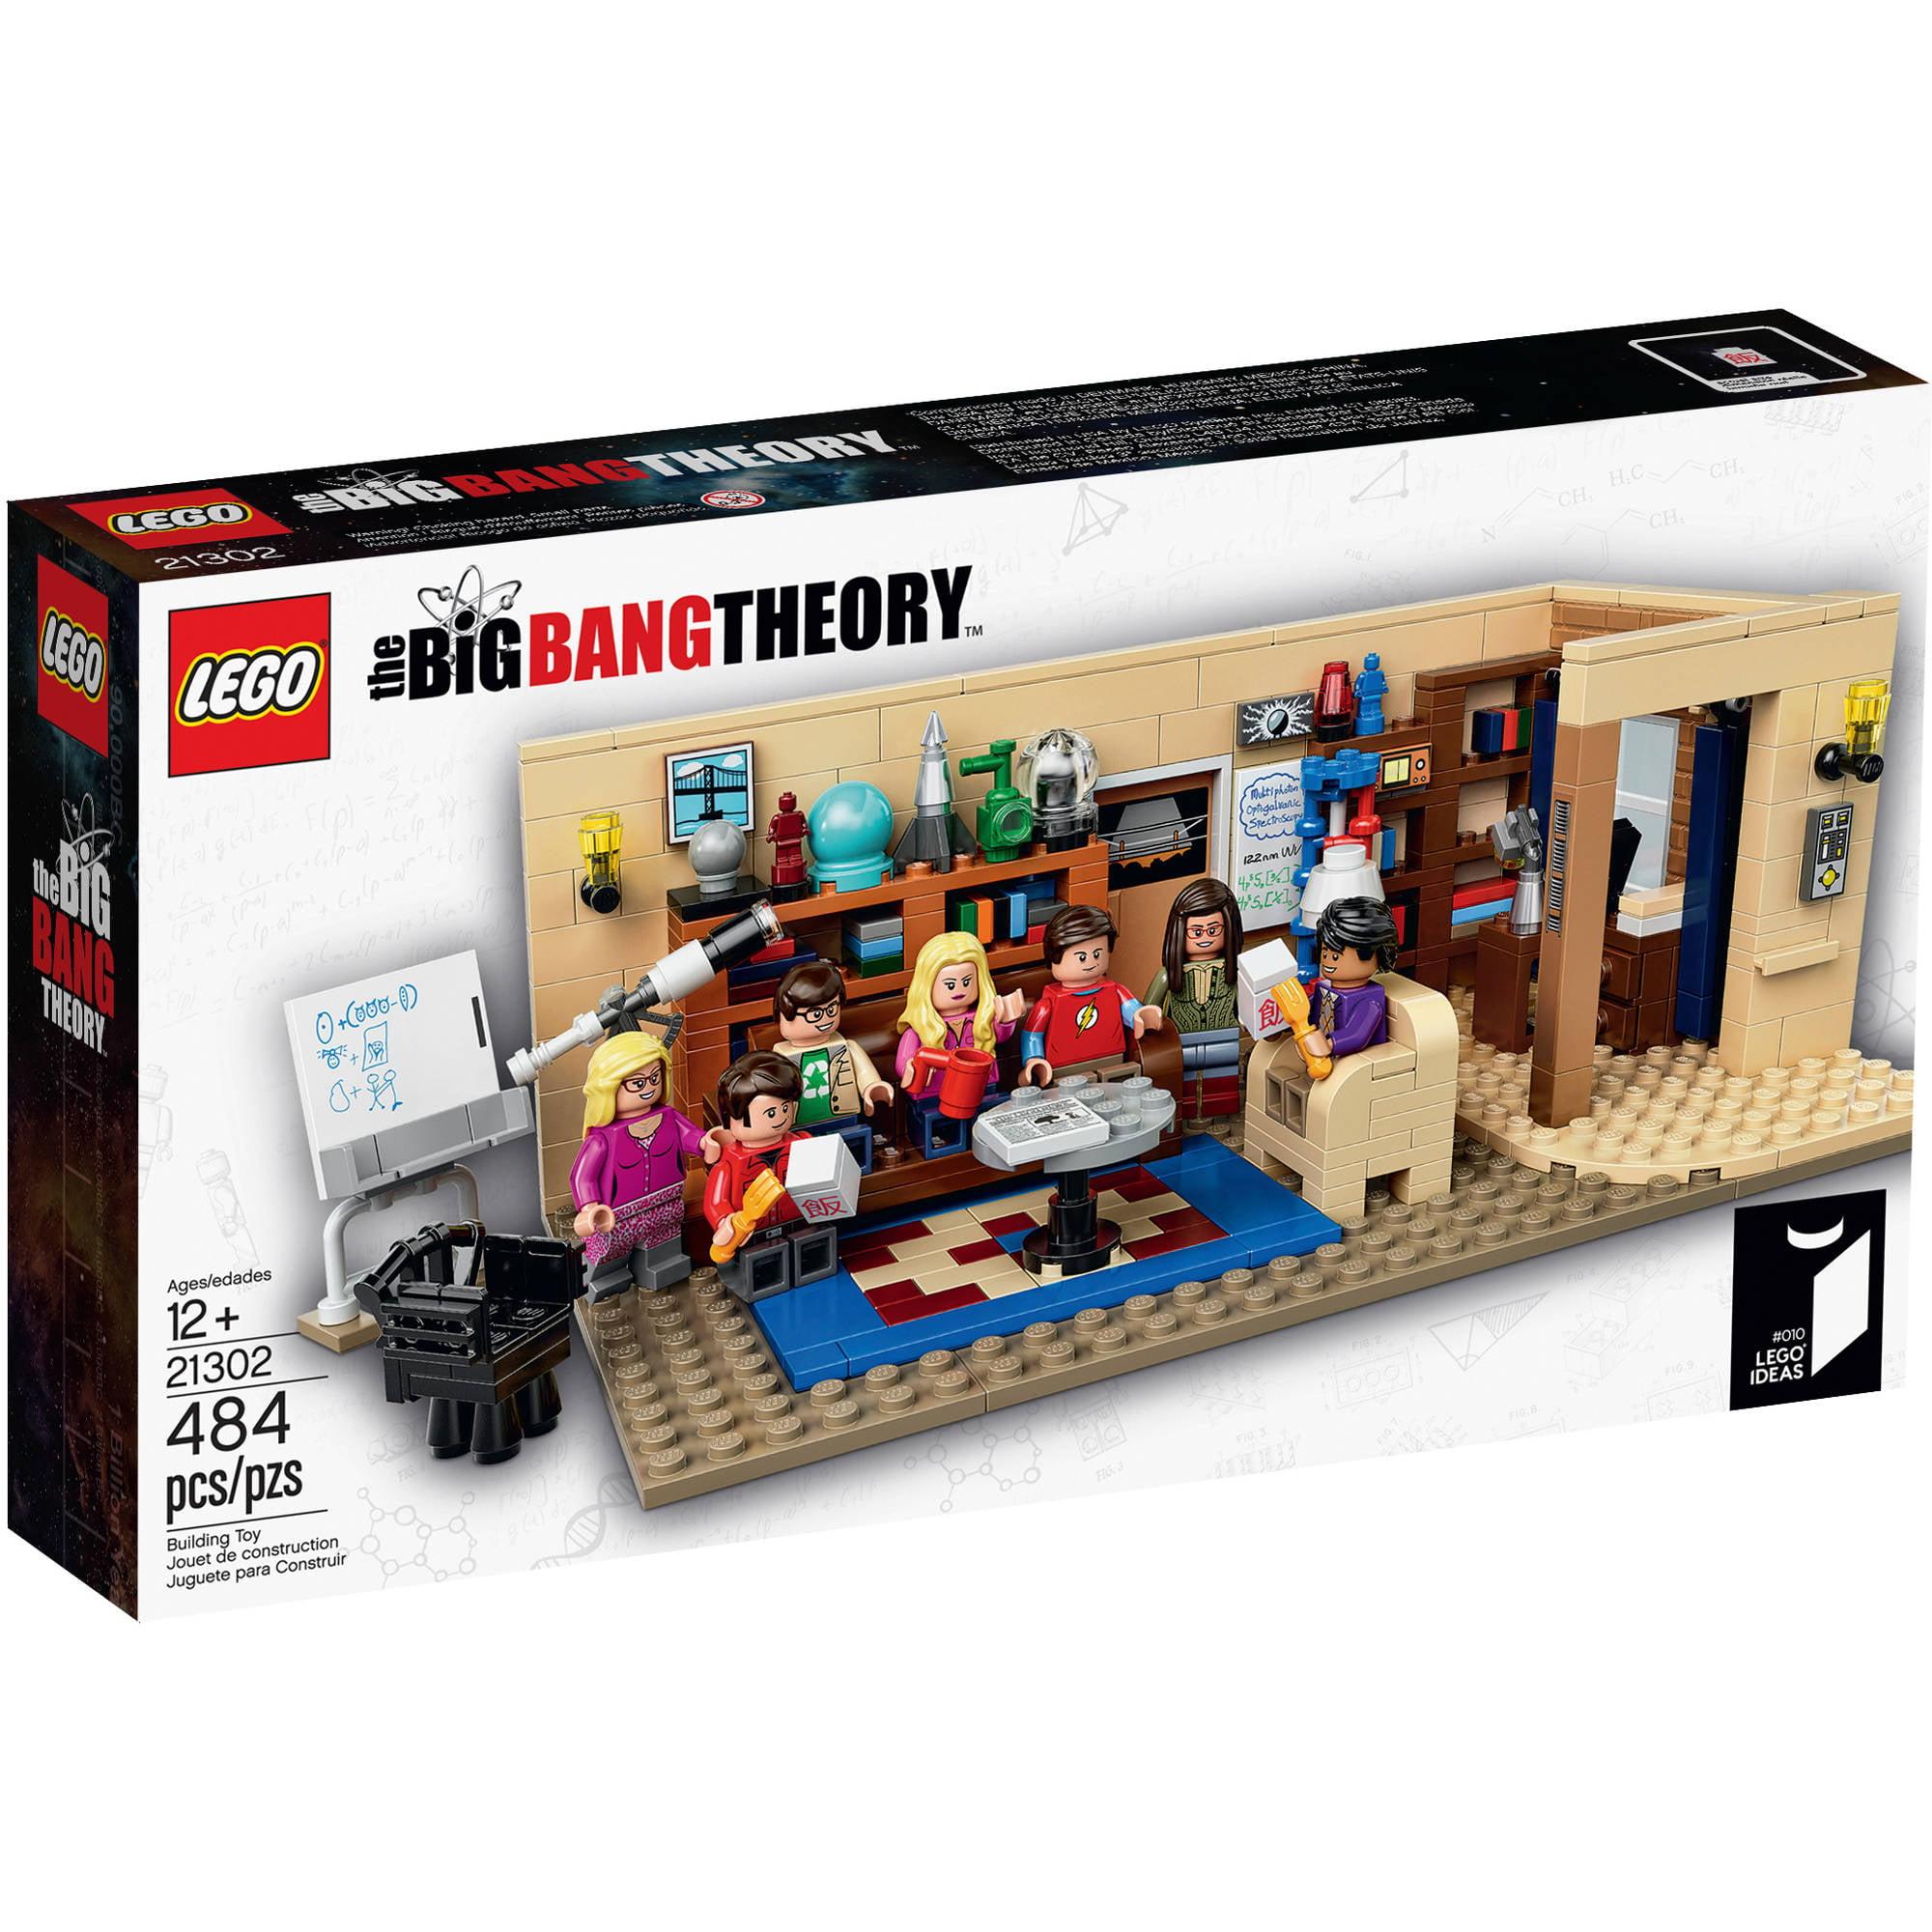 LEGO Ideas The Big Bang Theory, 21302